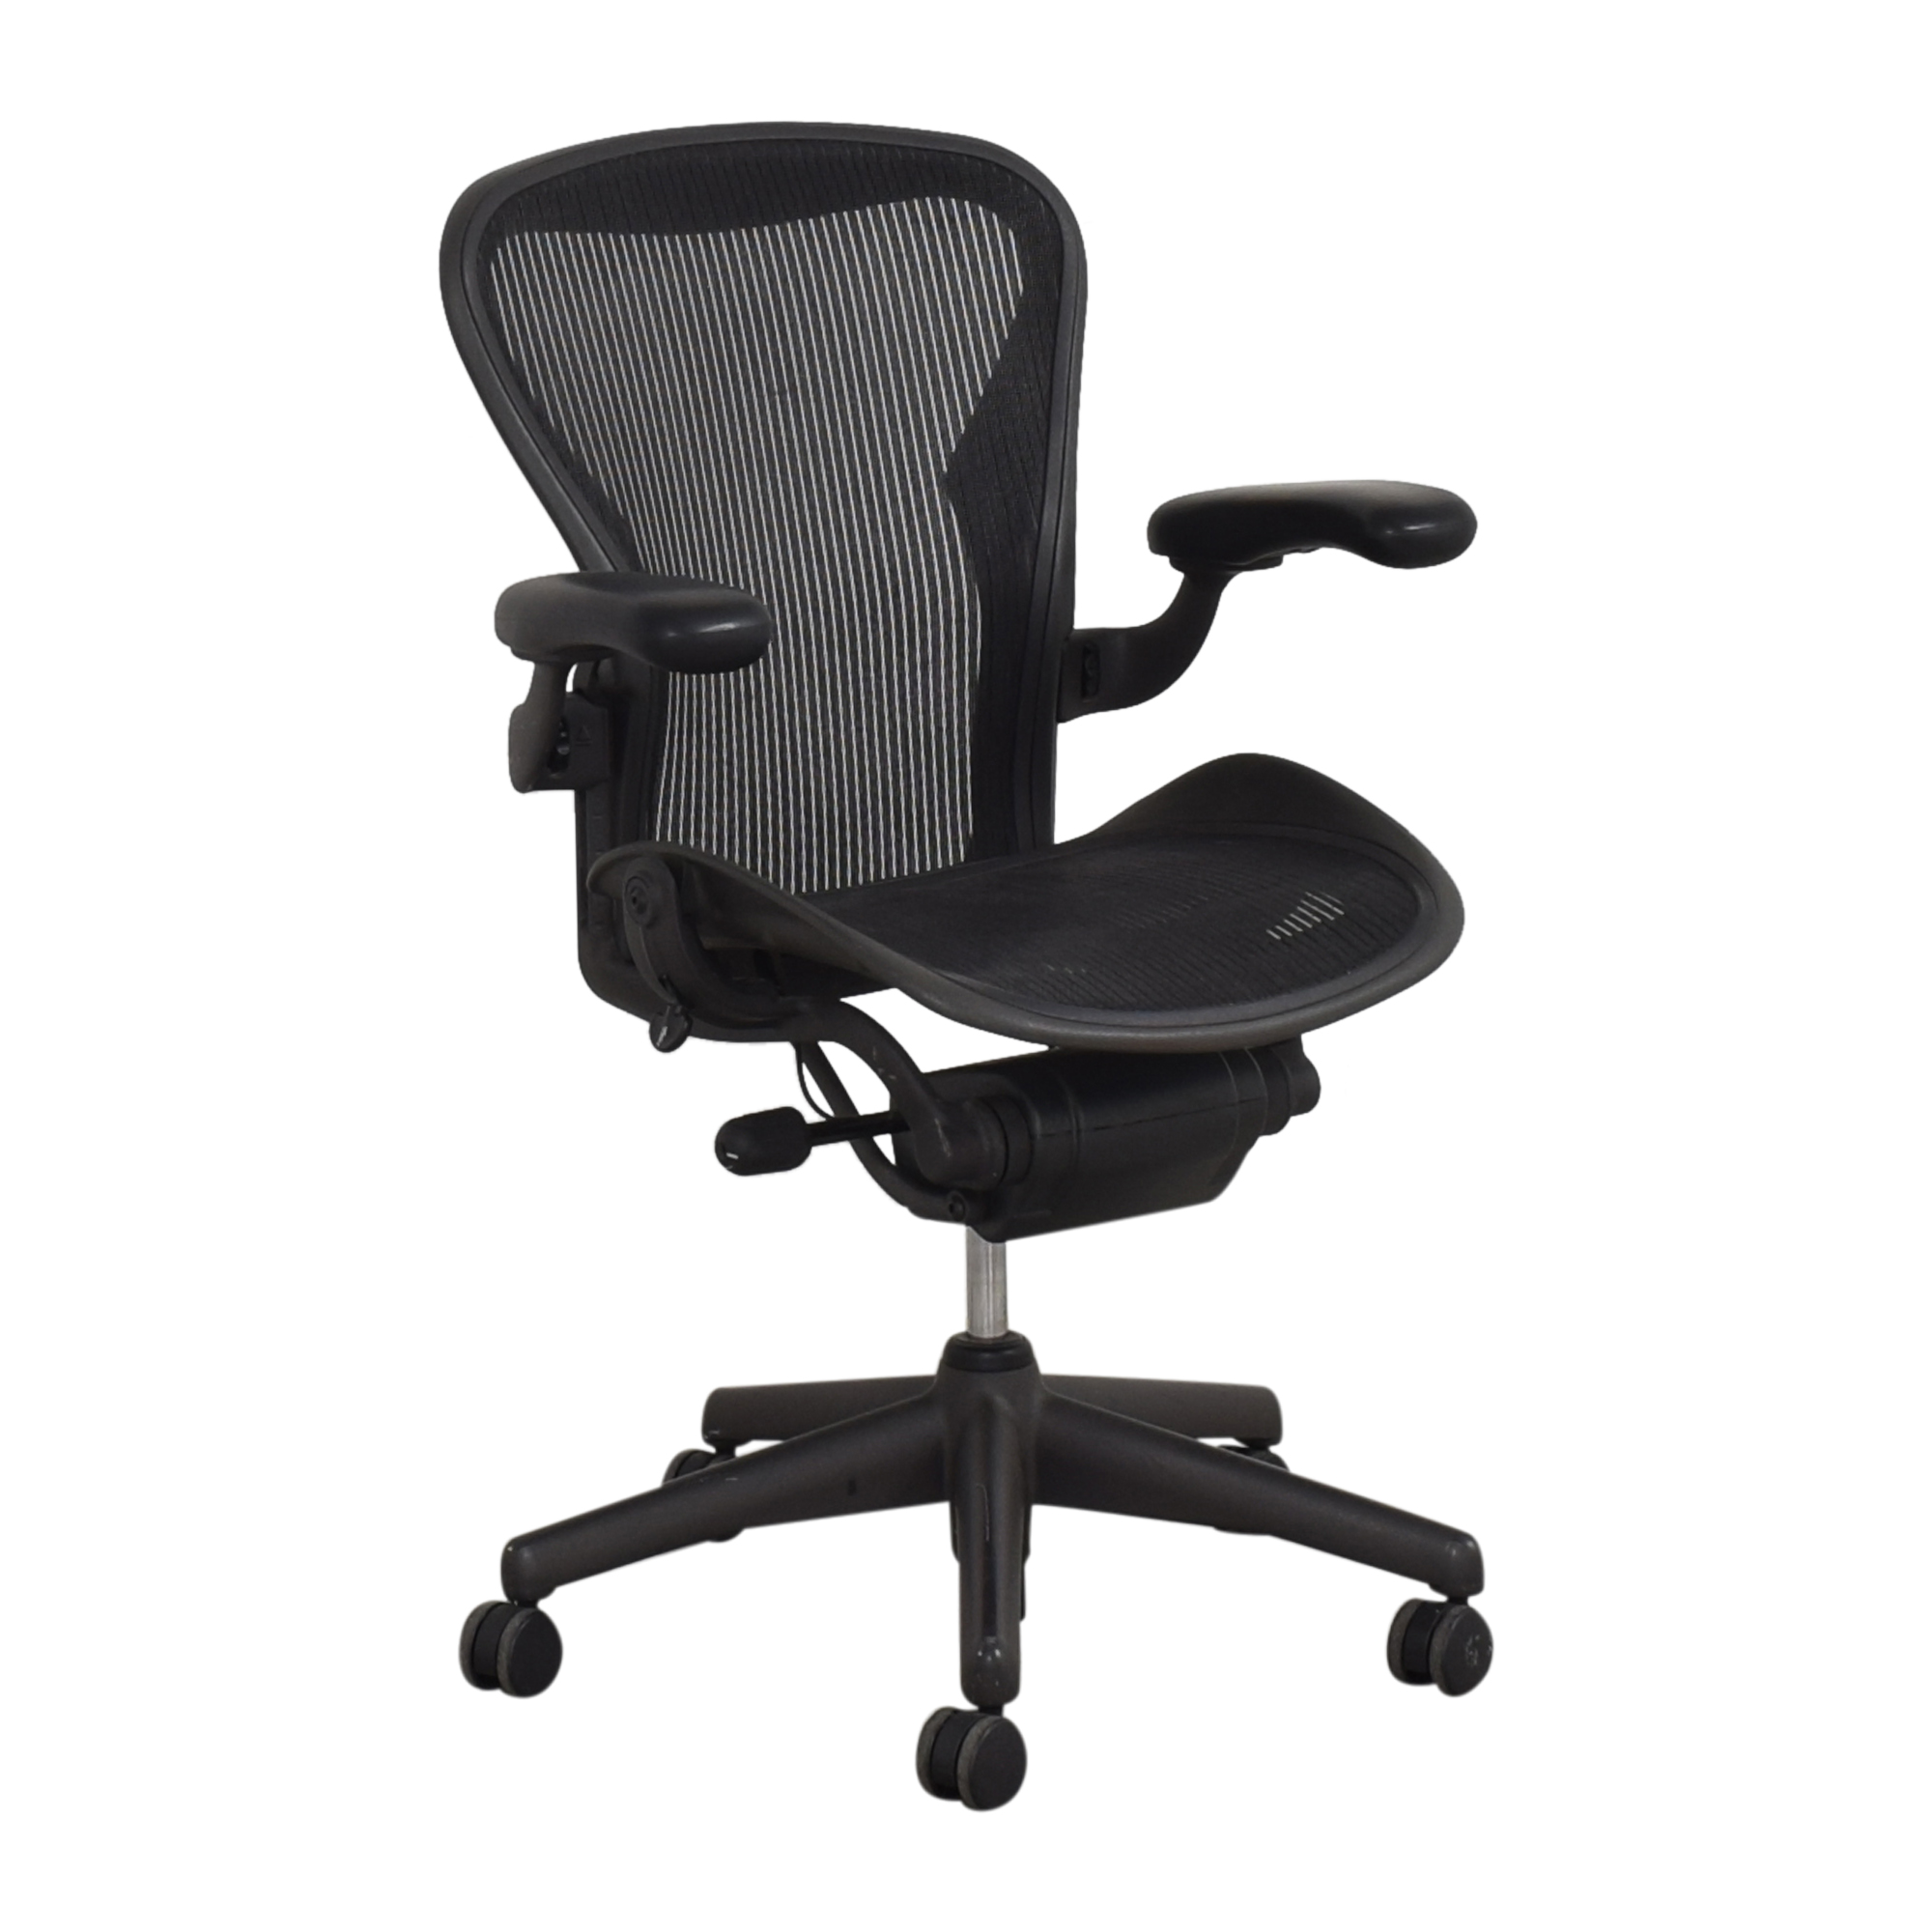 Herman Miller Aeron Size B Swivel Desk Chair / Home Office Chairs